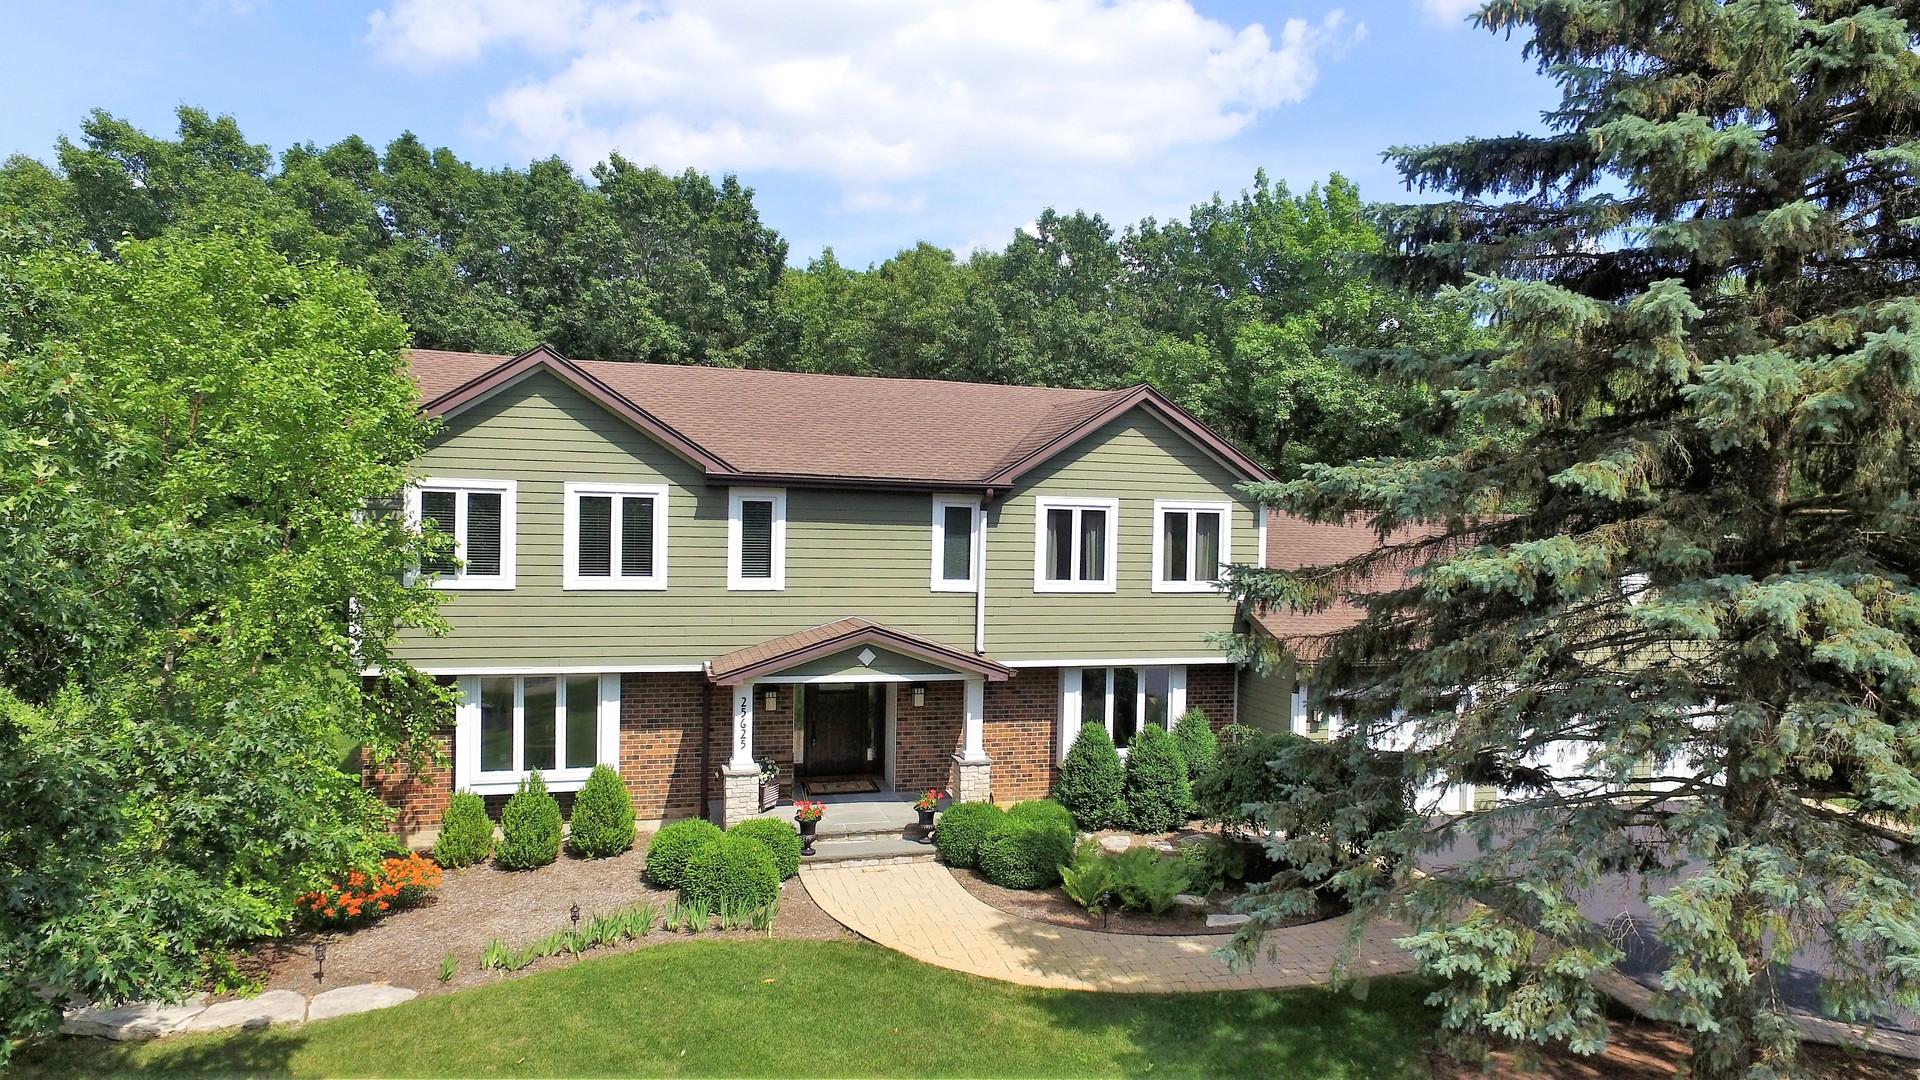 25625 North Oak Court, Barrington in Lake County, IL 60010 Home for Sale